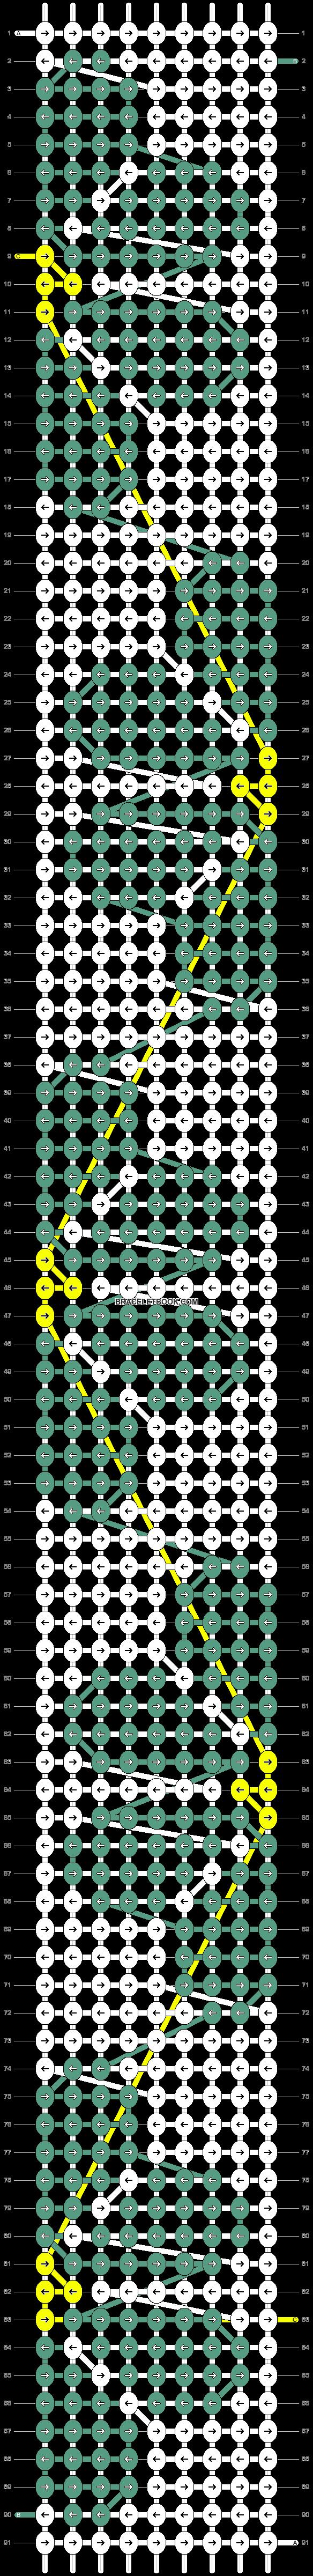 Alpha pattern #87723 pattern